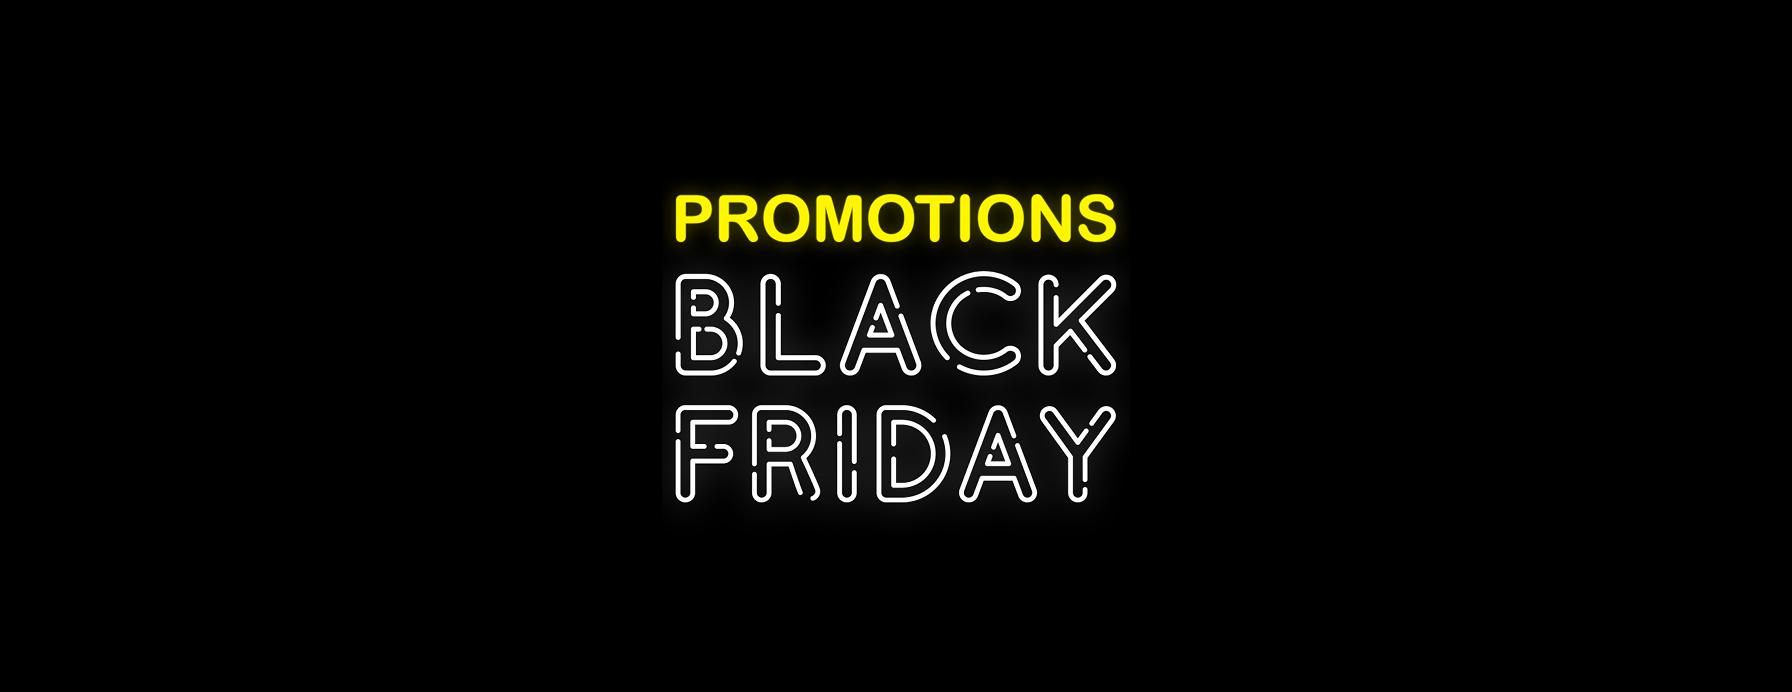 Ventes Black Friday